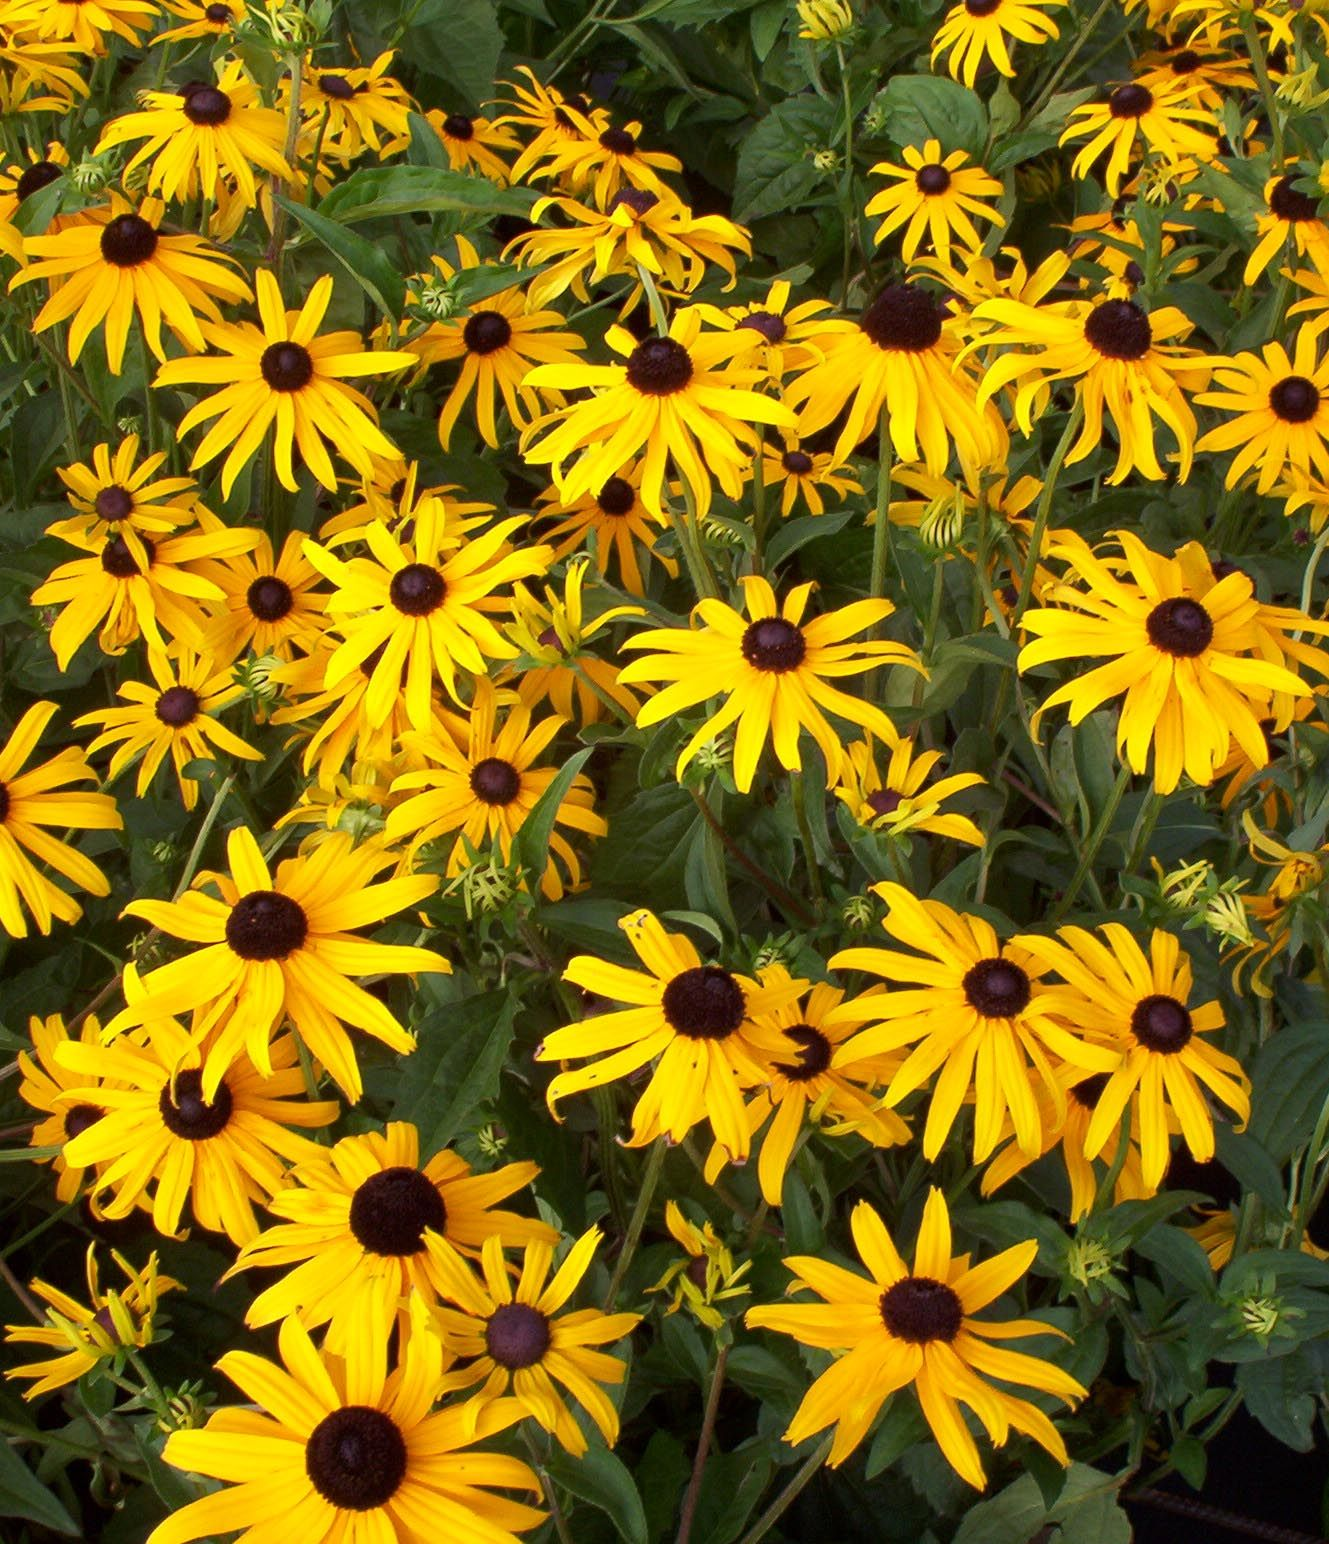 450171dbdf494f6c01440edaa516dc3e - The New Rhs Dictionary Of Gardening